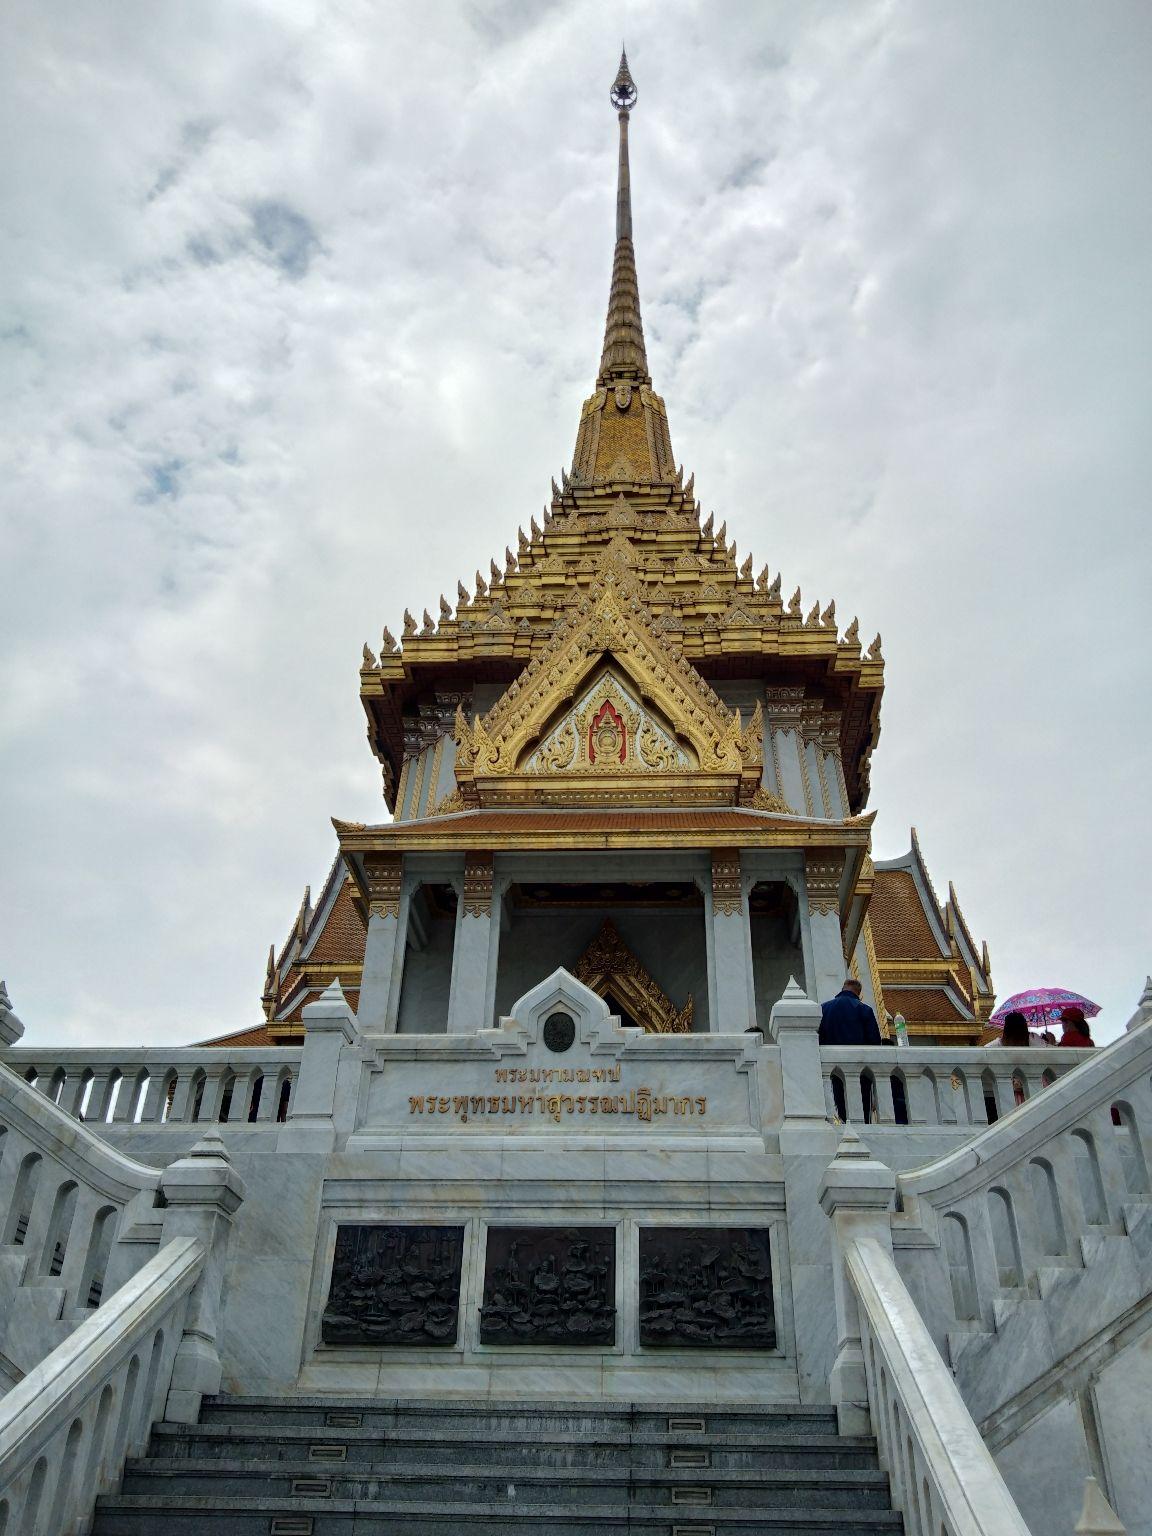 Photo of Somdet Chao Phraya By Kailash chand bairwa